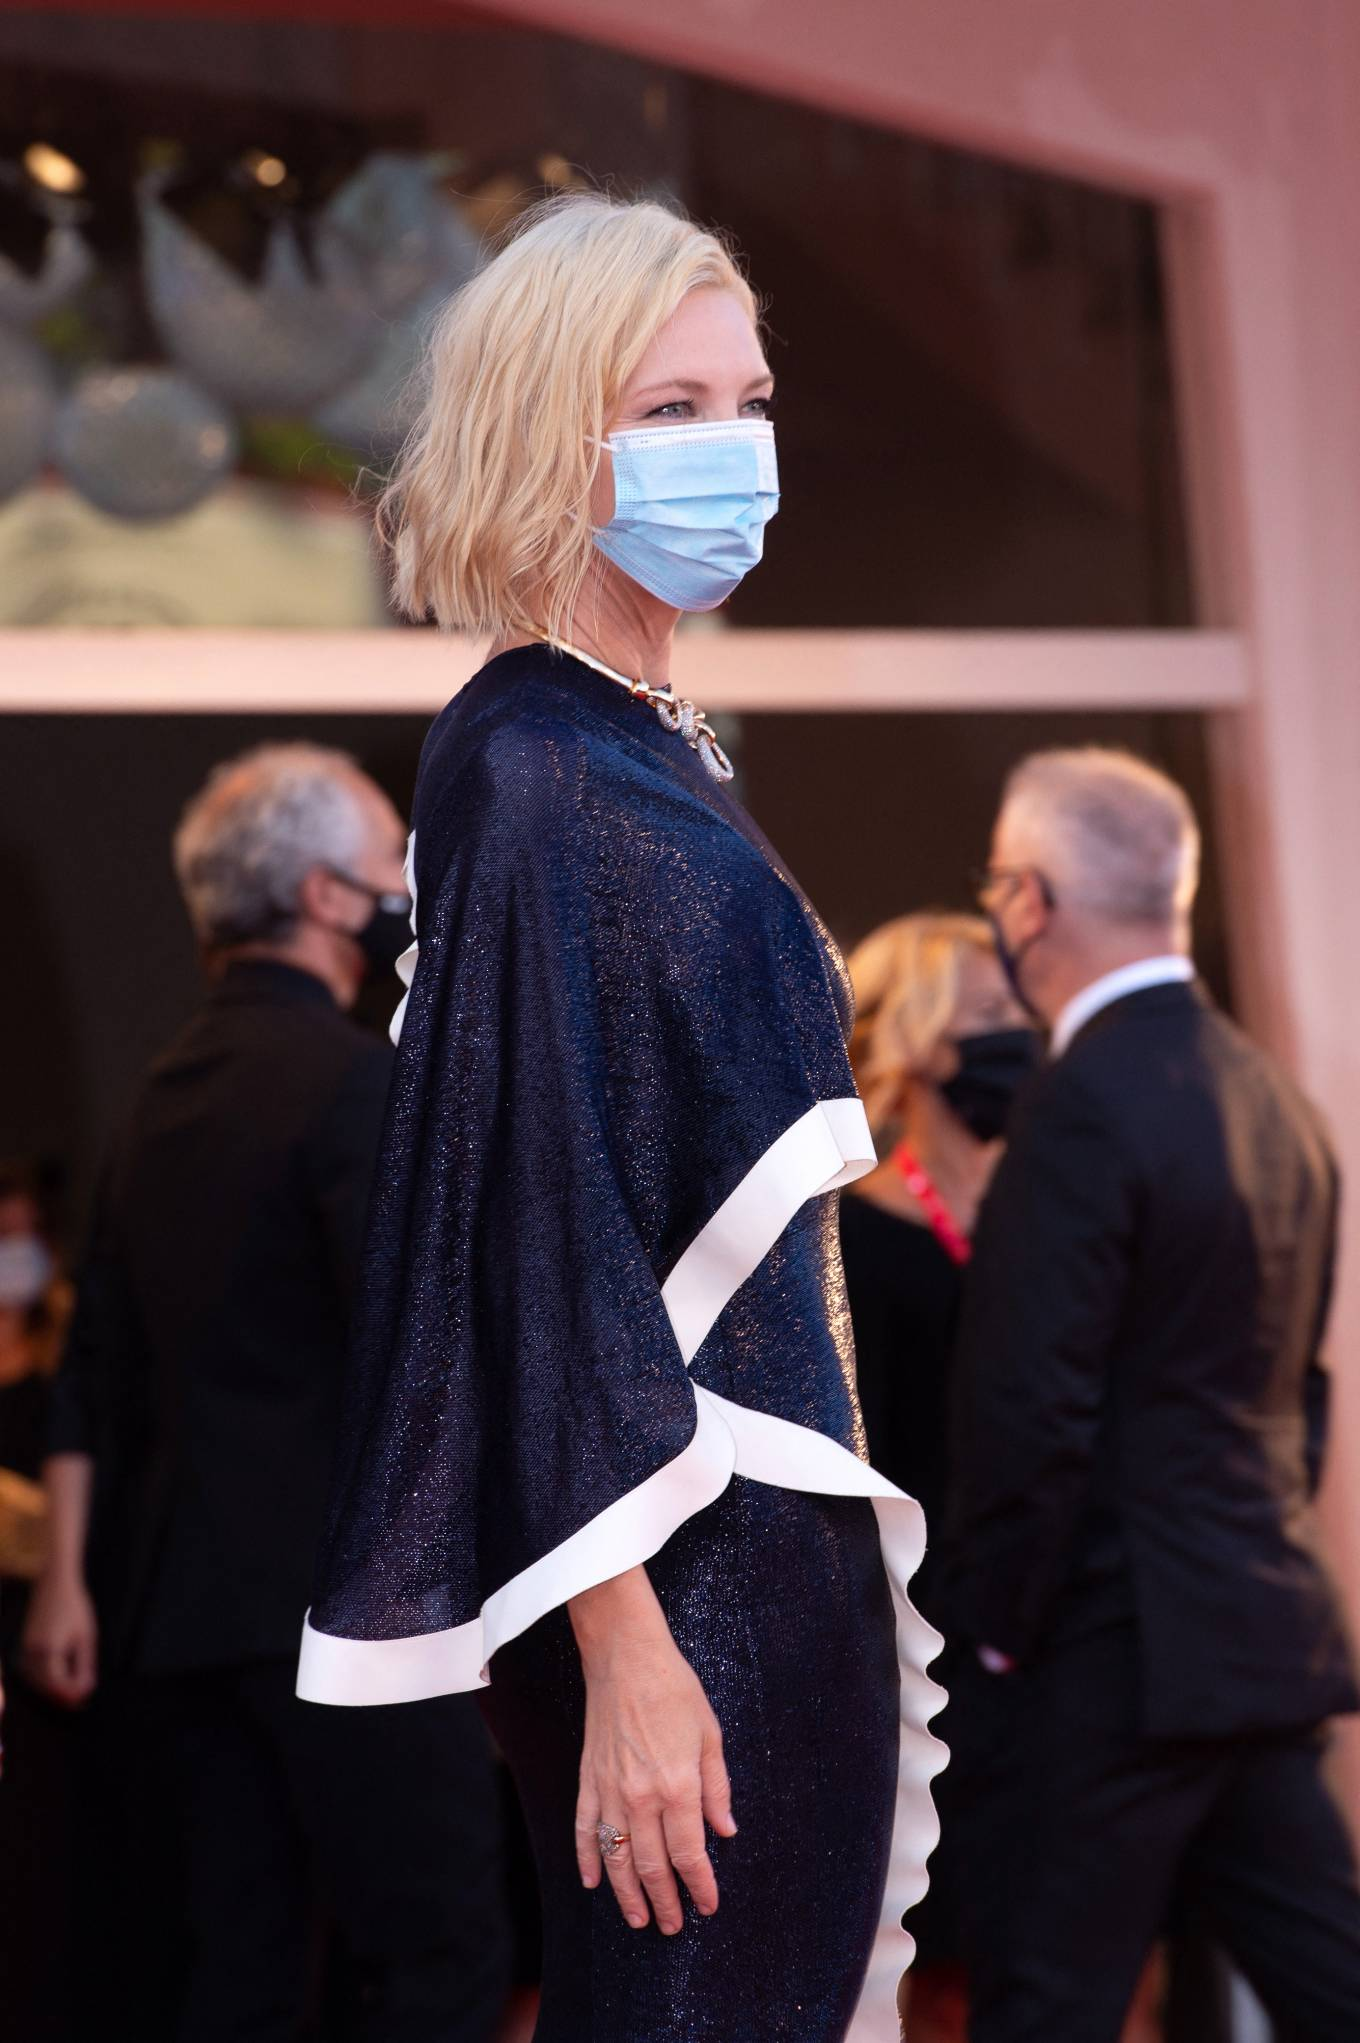 Cate Blanchett 2020 : Cate Blanchett attending Opening Ceremony at 2020 Venice International Film Festival – Italy-06